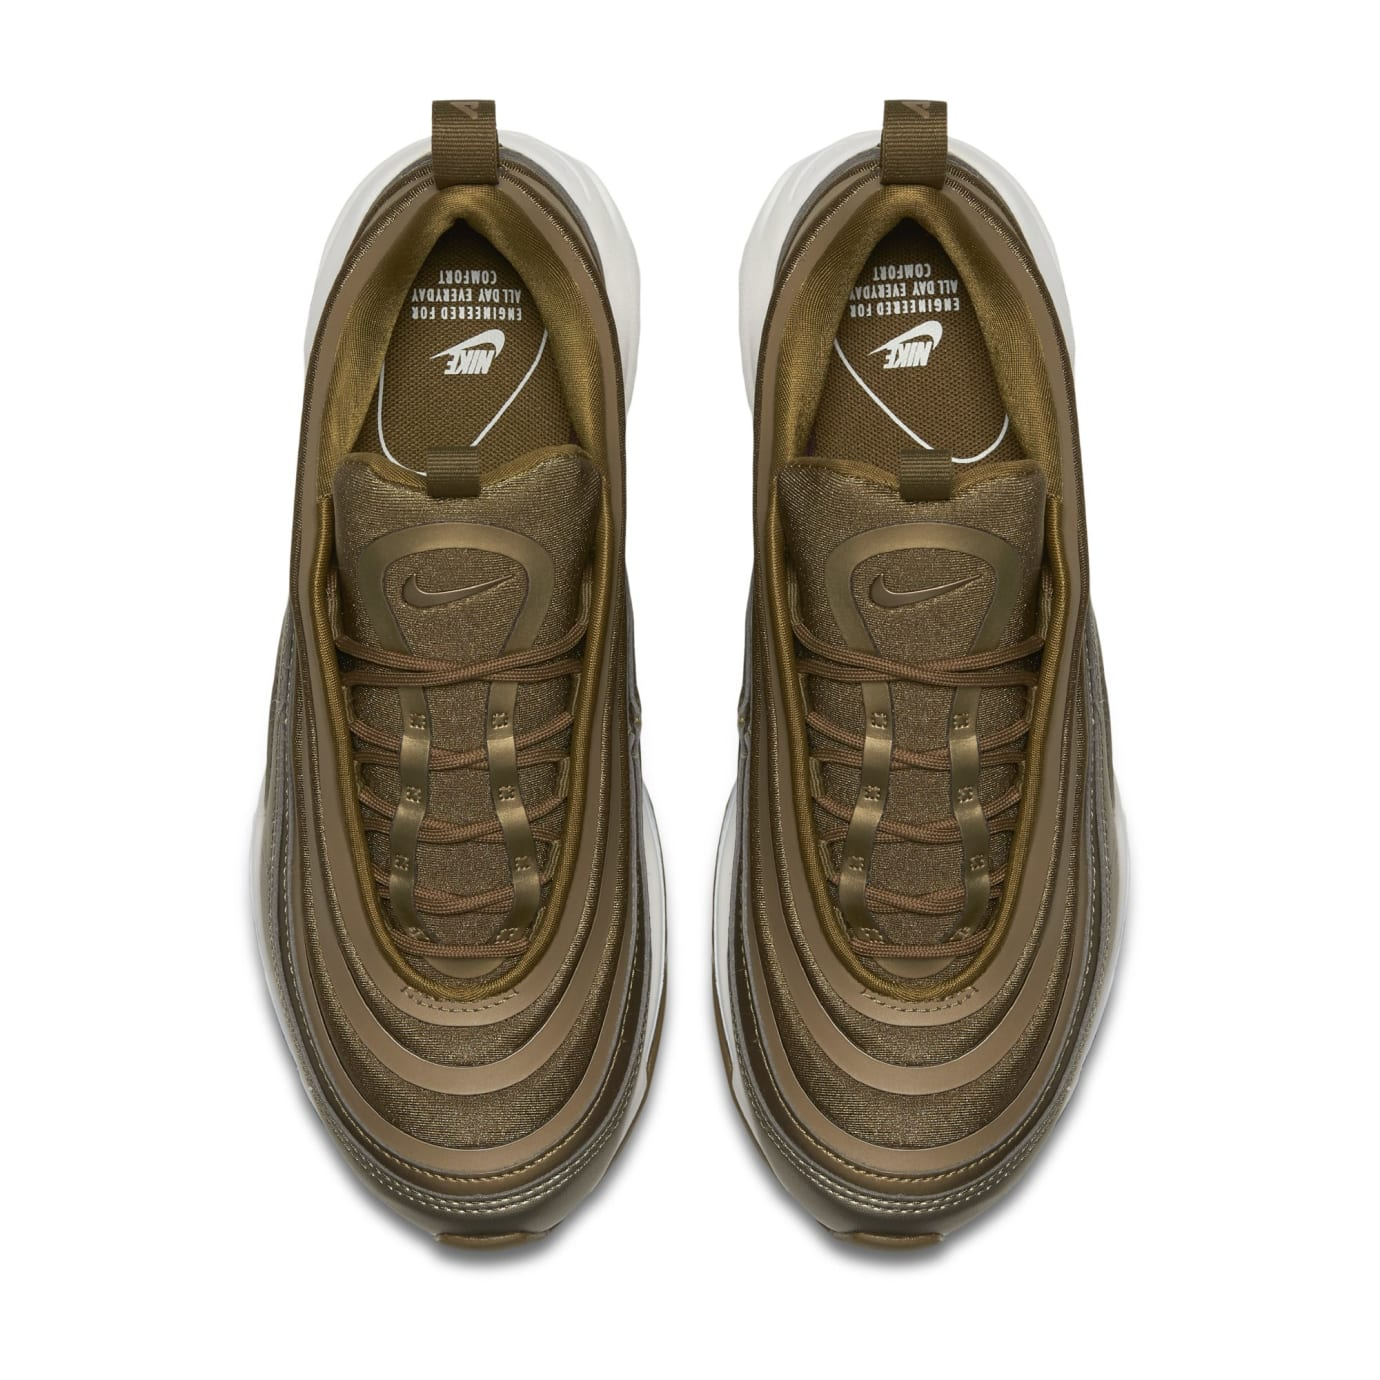 Nike Air Max 97 Ultra Metallic Gold (Top)